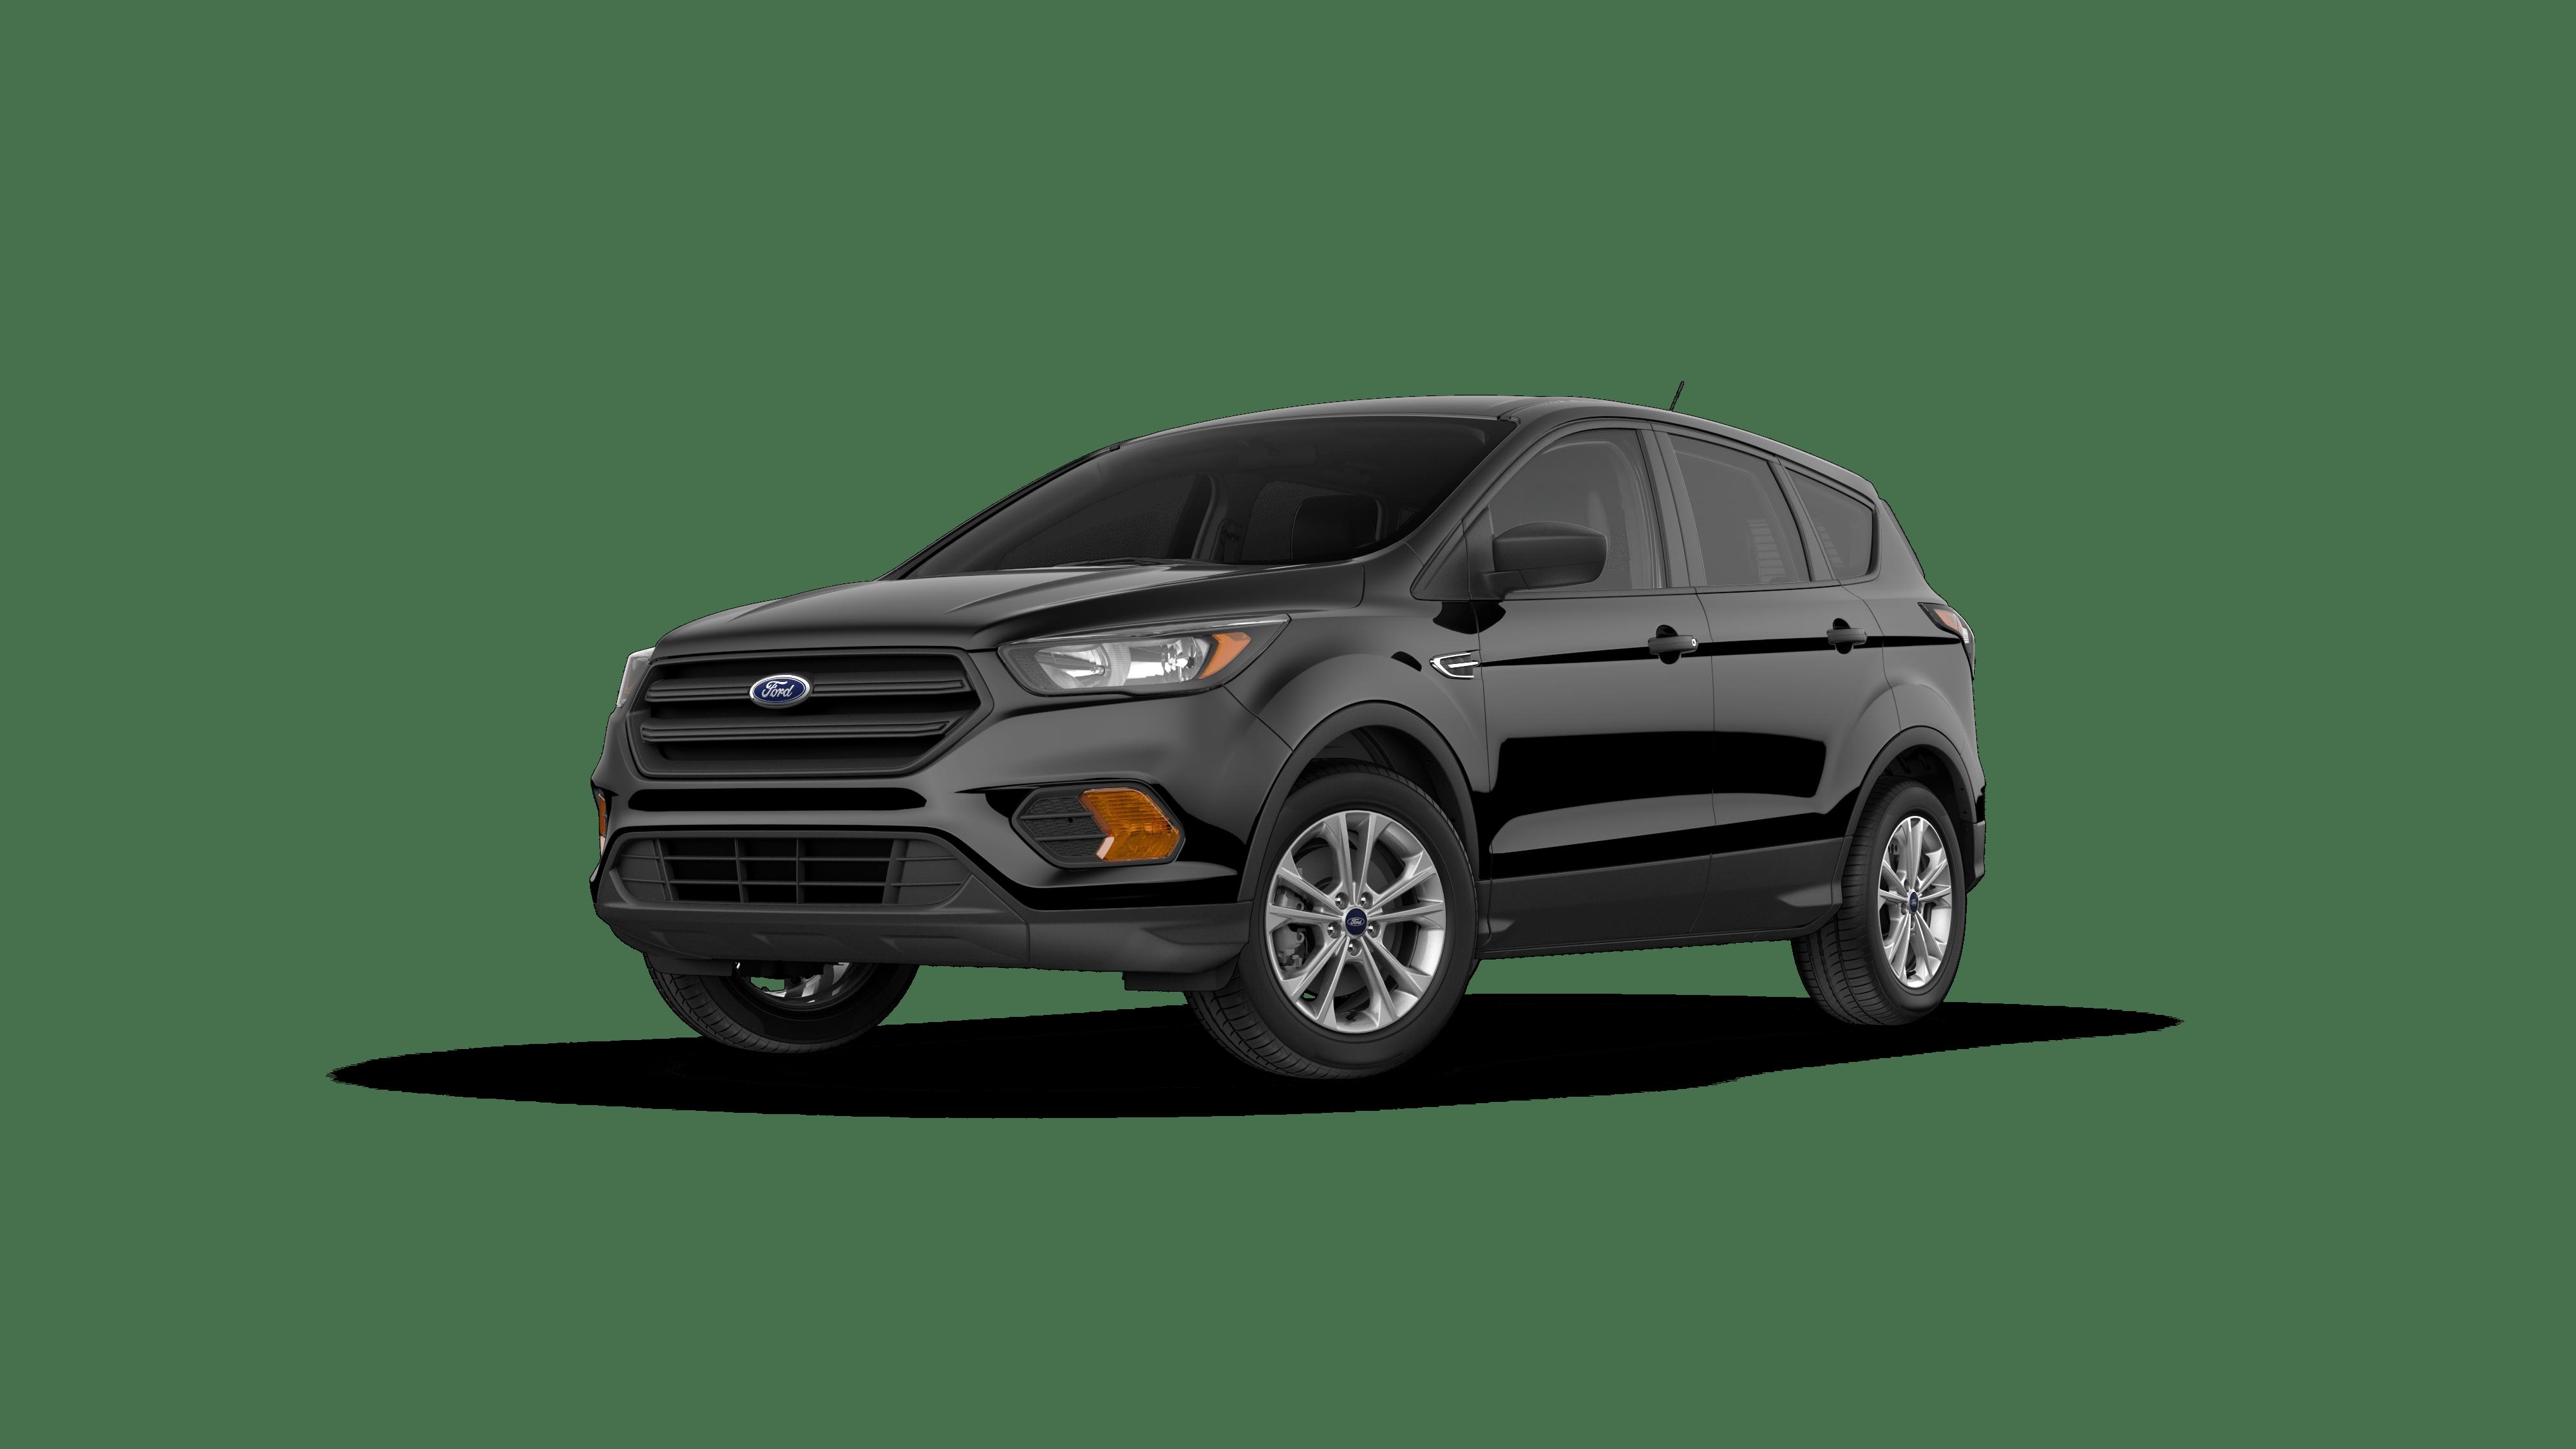 2018 ford escape for sale in fort pierce 1fmcu0f71jub55474 sunrise ford. Black Bedroom Furniture Sets. Home Design Ideas